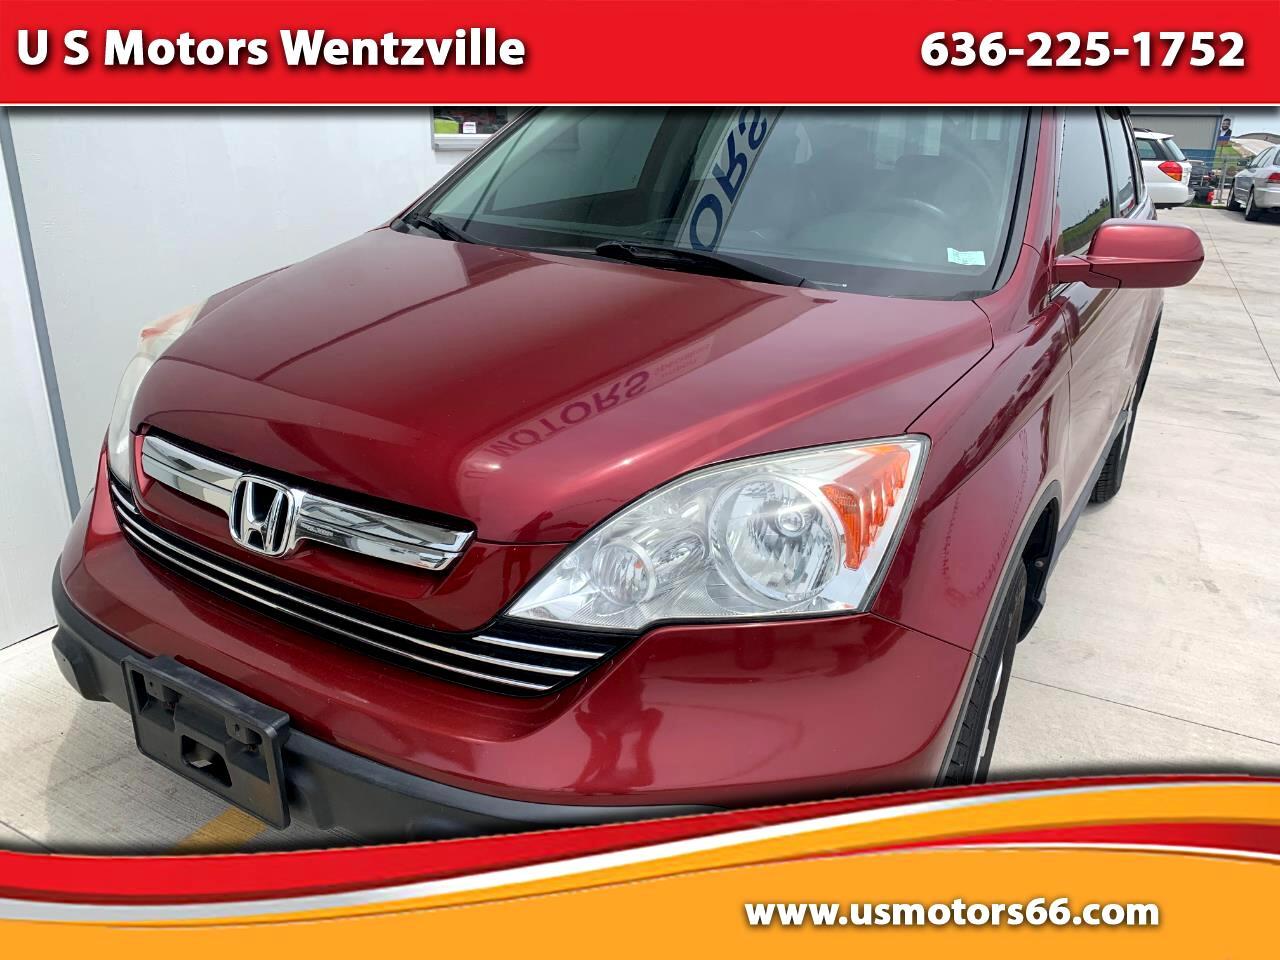 Honda CR-V 4WD 5dr EX-L 2009